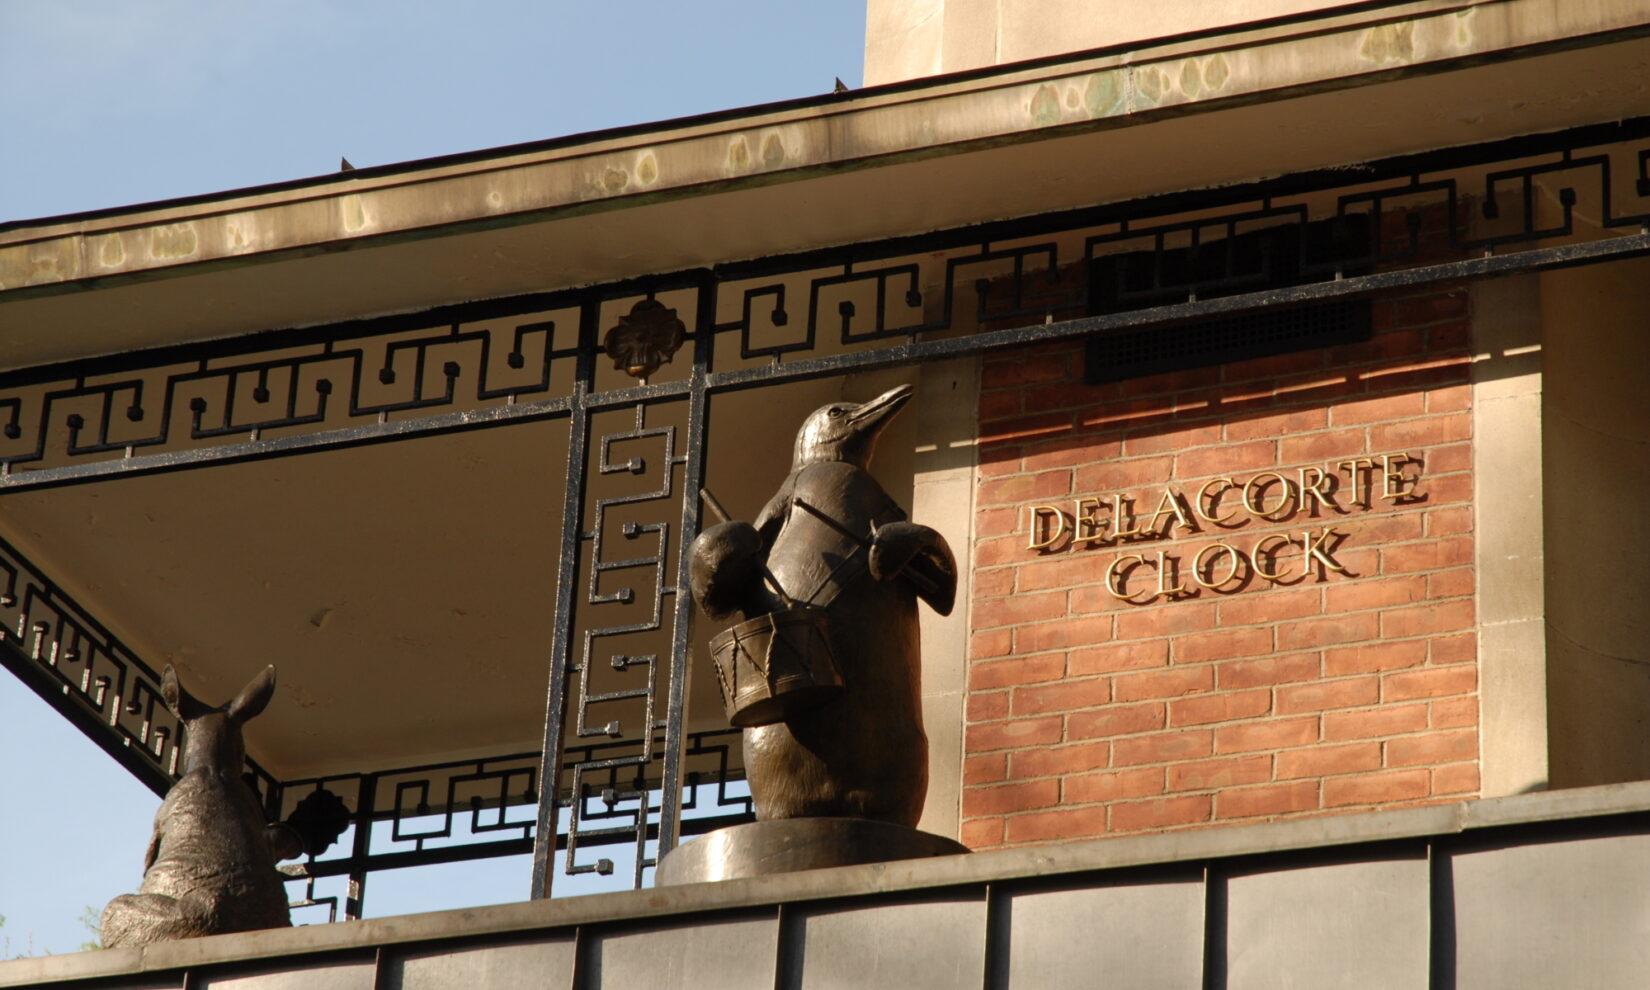 The penguins of the Delacorte Clock